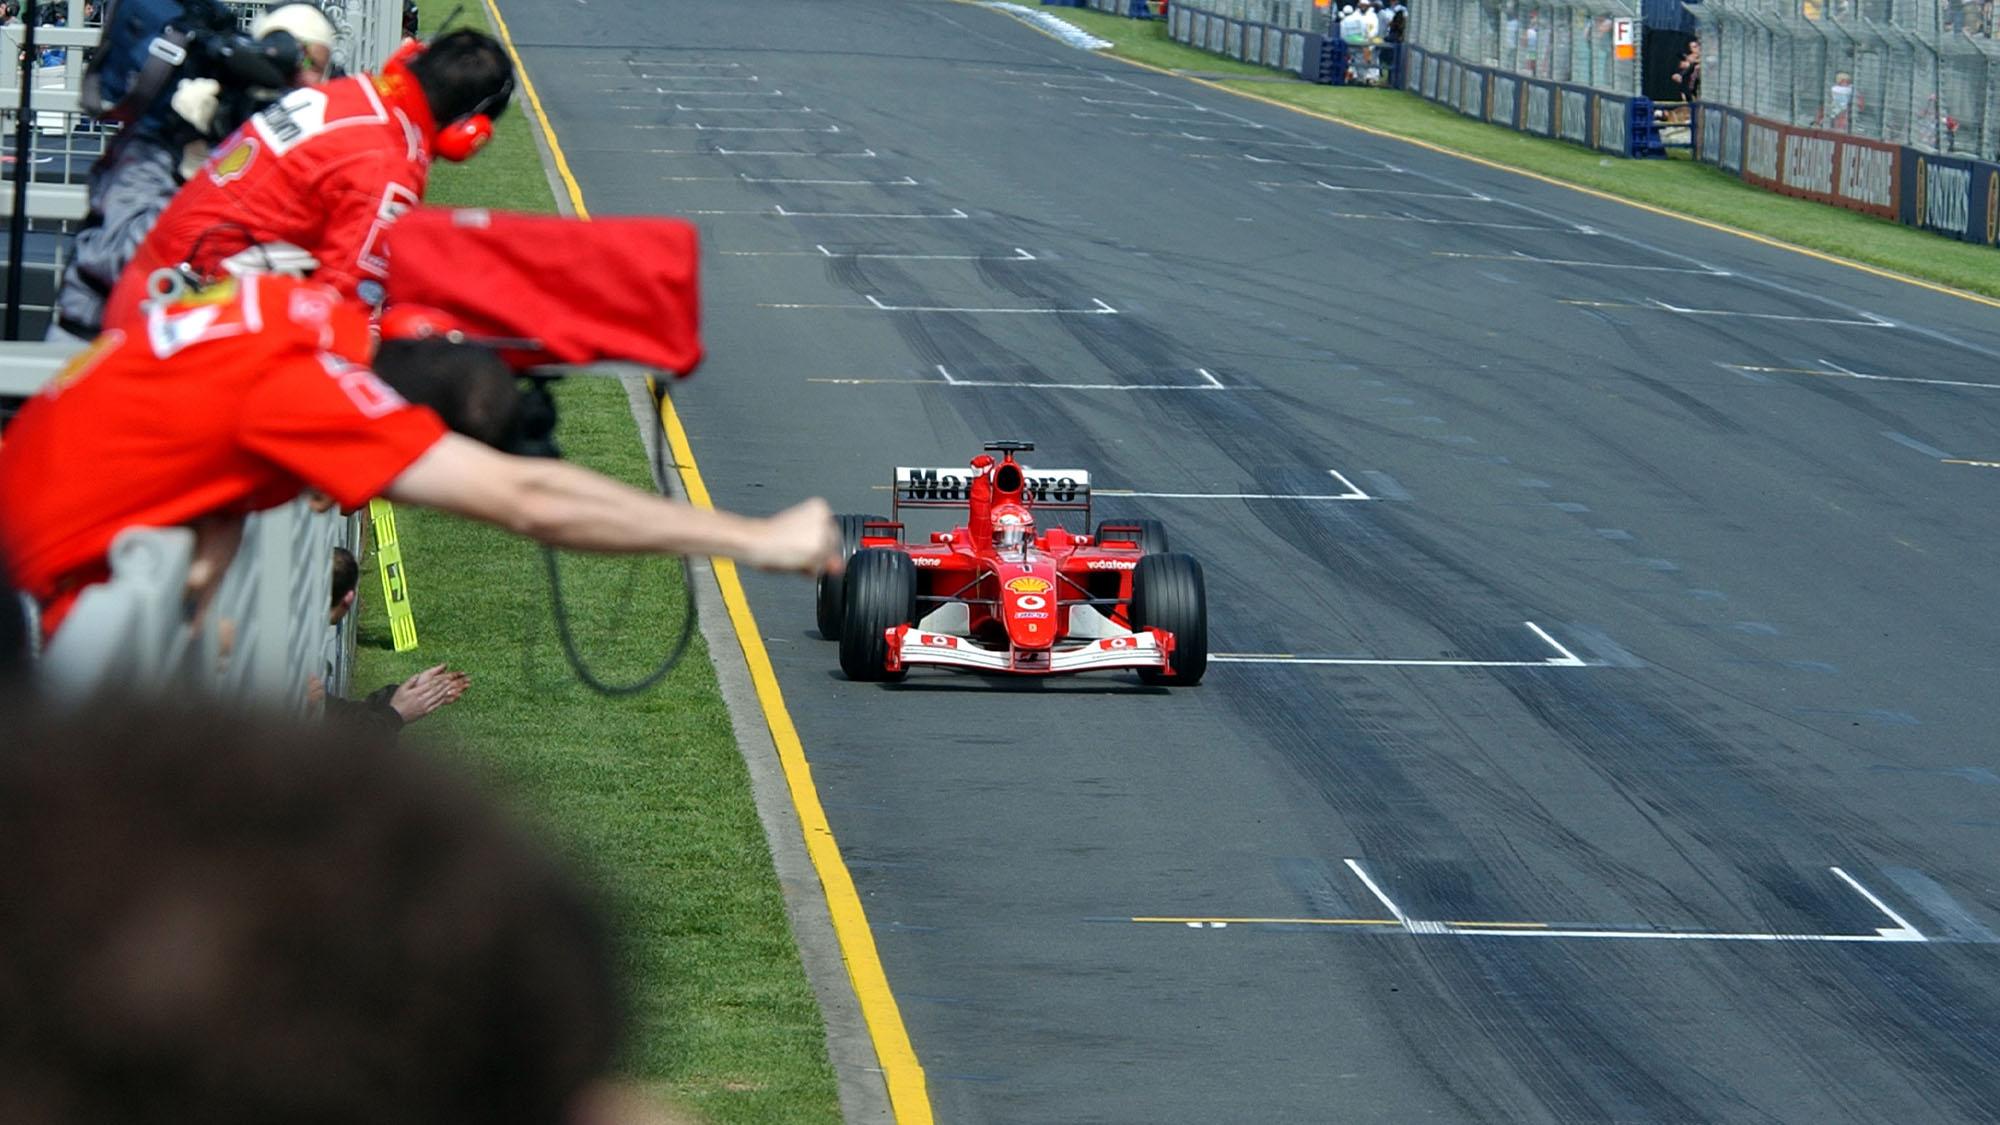 AUTO - F1 2002 - AUSTRALIA GP - MELBOURNE 20020303 - PHOTO: GILLES LEVENT / DPPI N¡ 1 - MICHAEL SCHUMACHER (GER) / FERRARI - ACTION FINISH LINE # 00000691_333